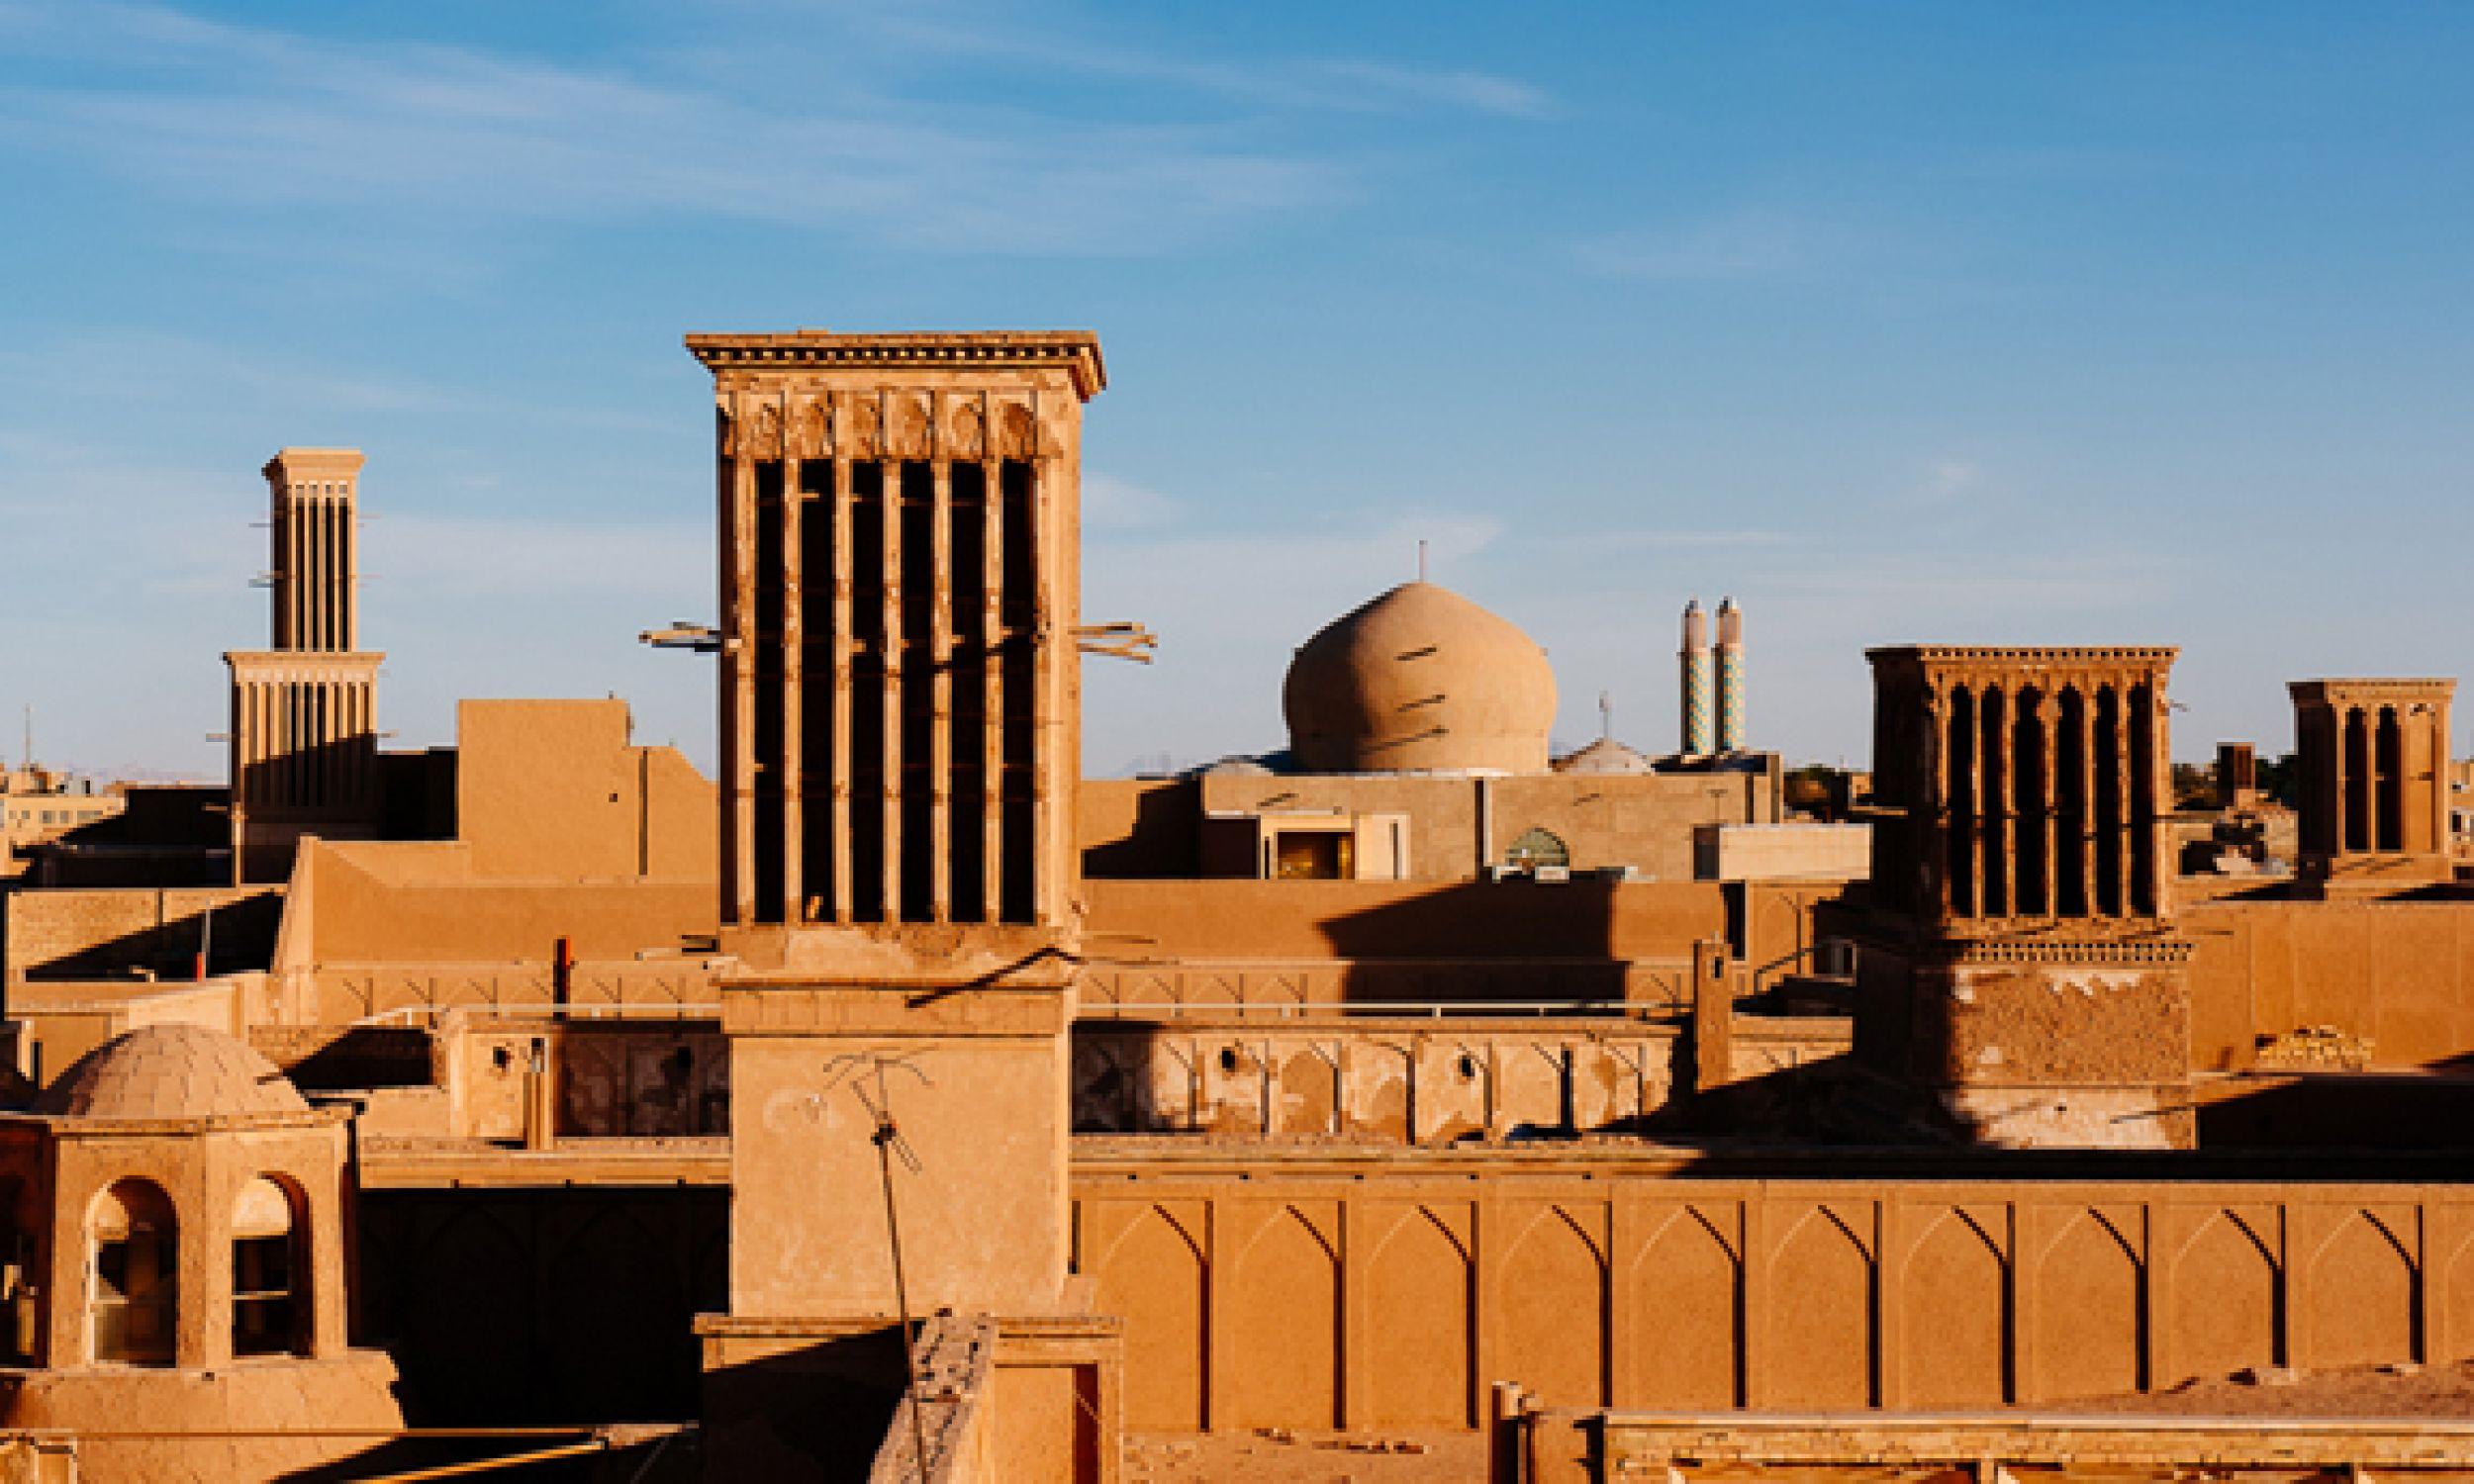 Randki z kulturą Iranu